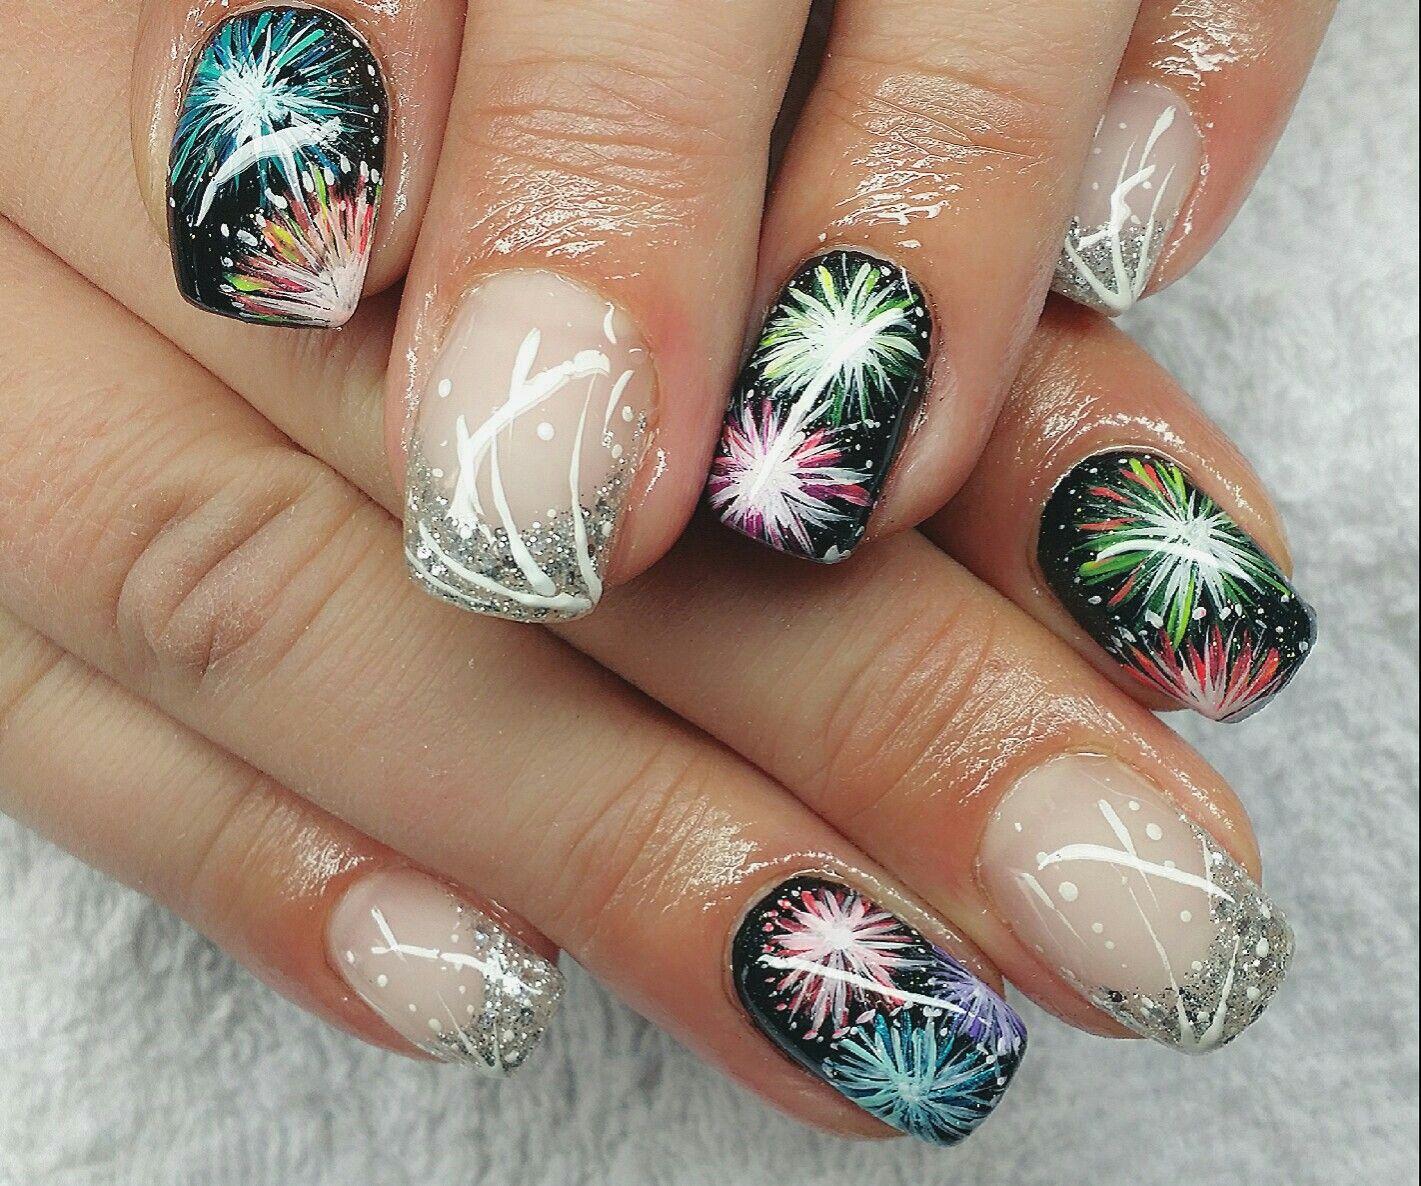 Nail Design Fullcover Silvester | Siebenschön Nails | Pinterest ...